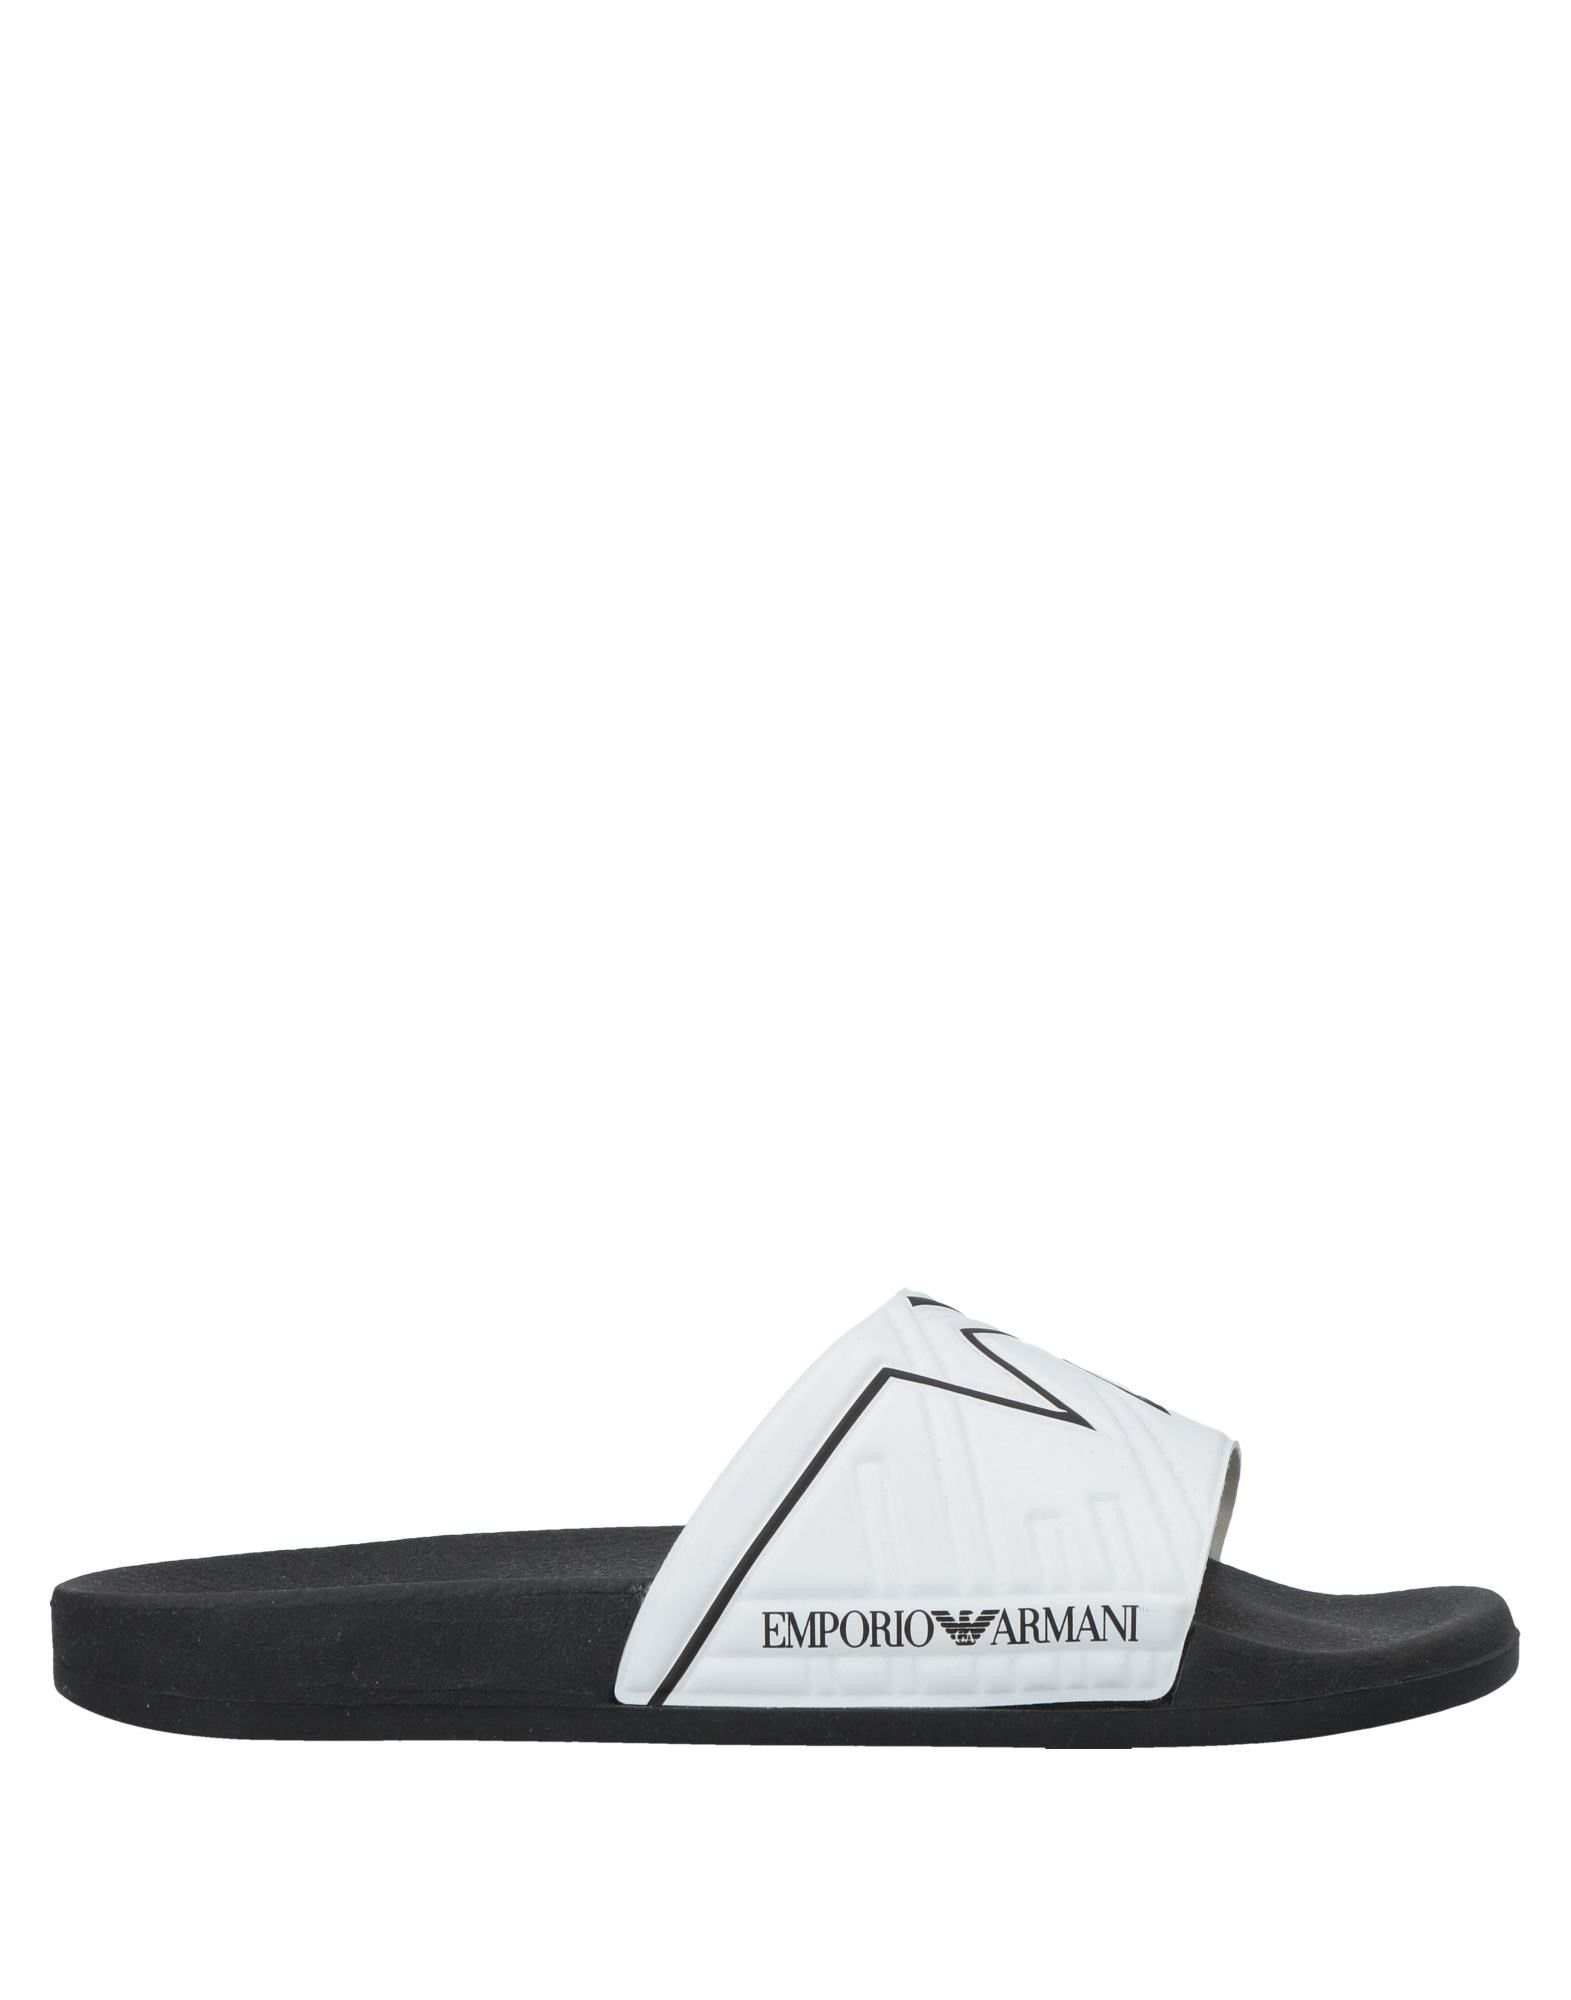 EMPORIO ARMANI Домашние туфли flip flop домашние туфли